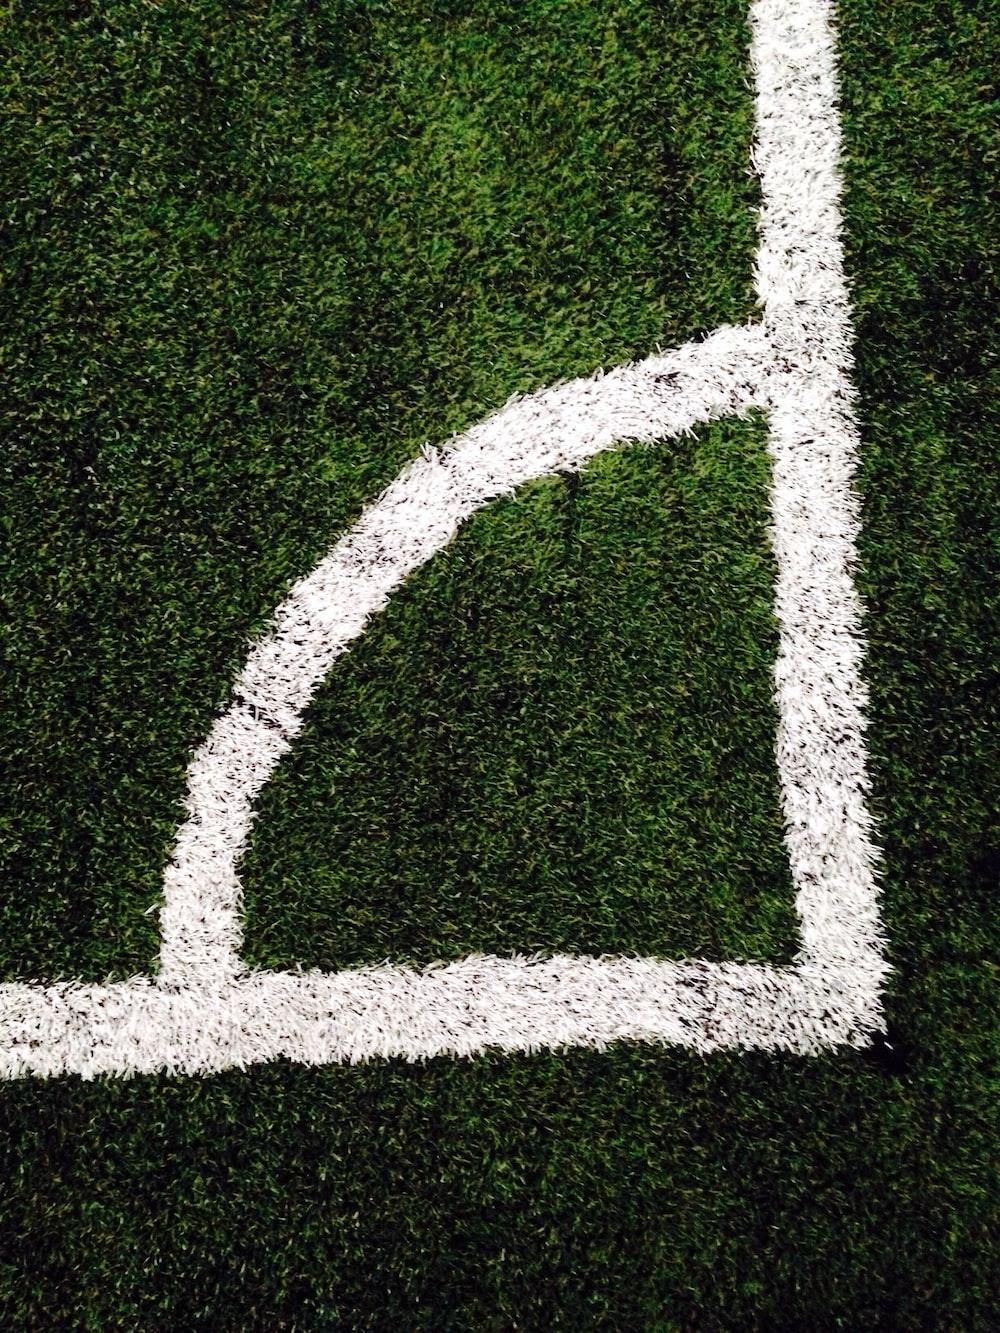 closeup photo of green grass ground